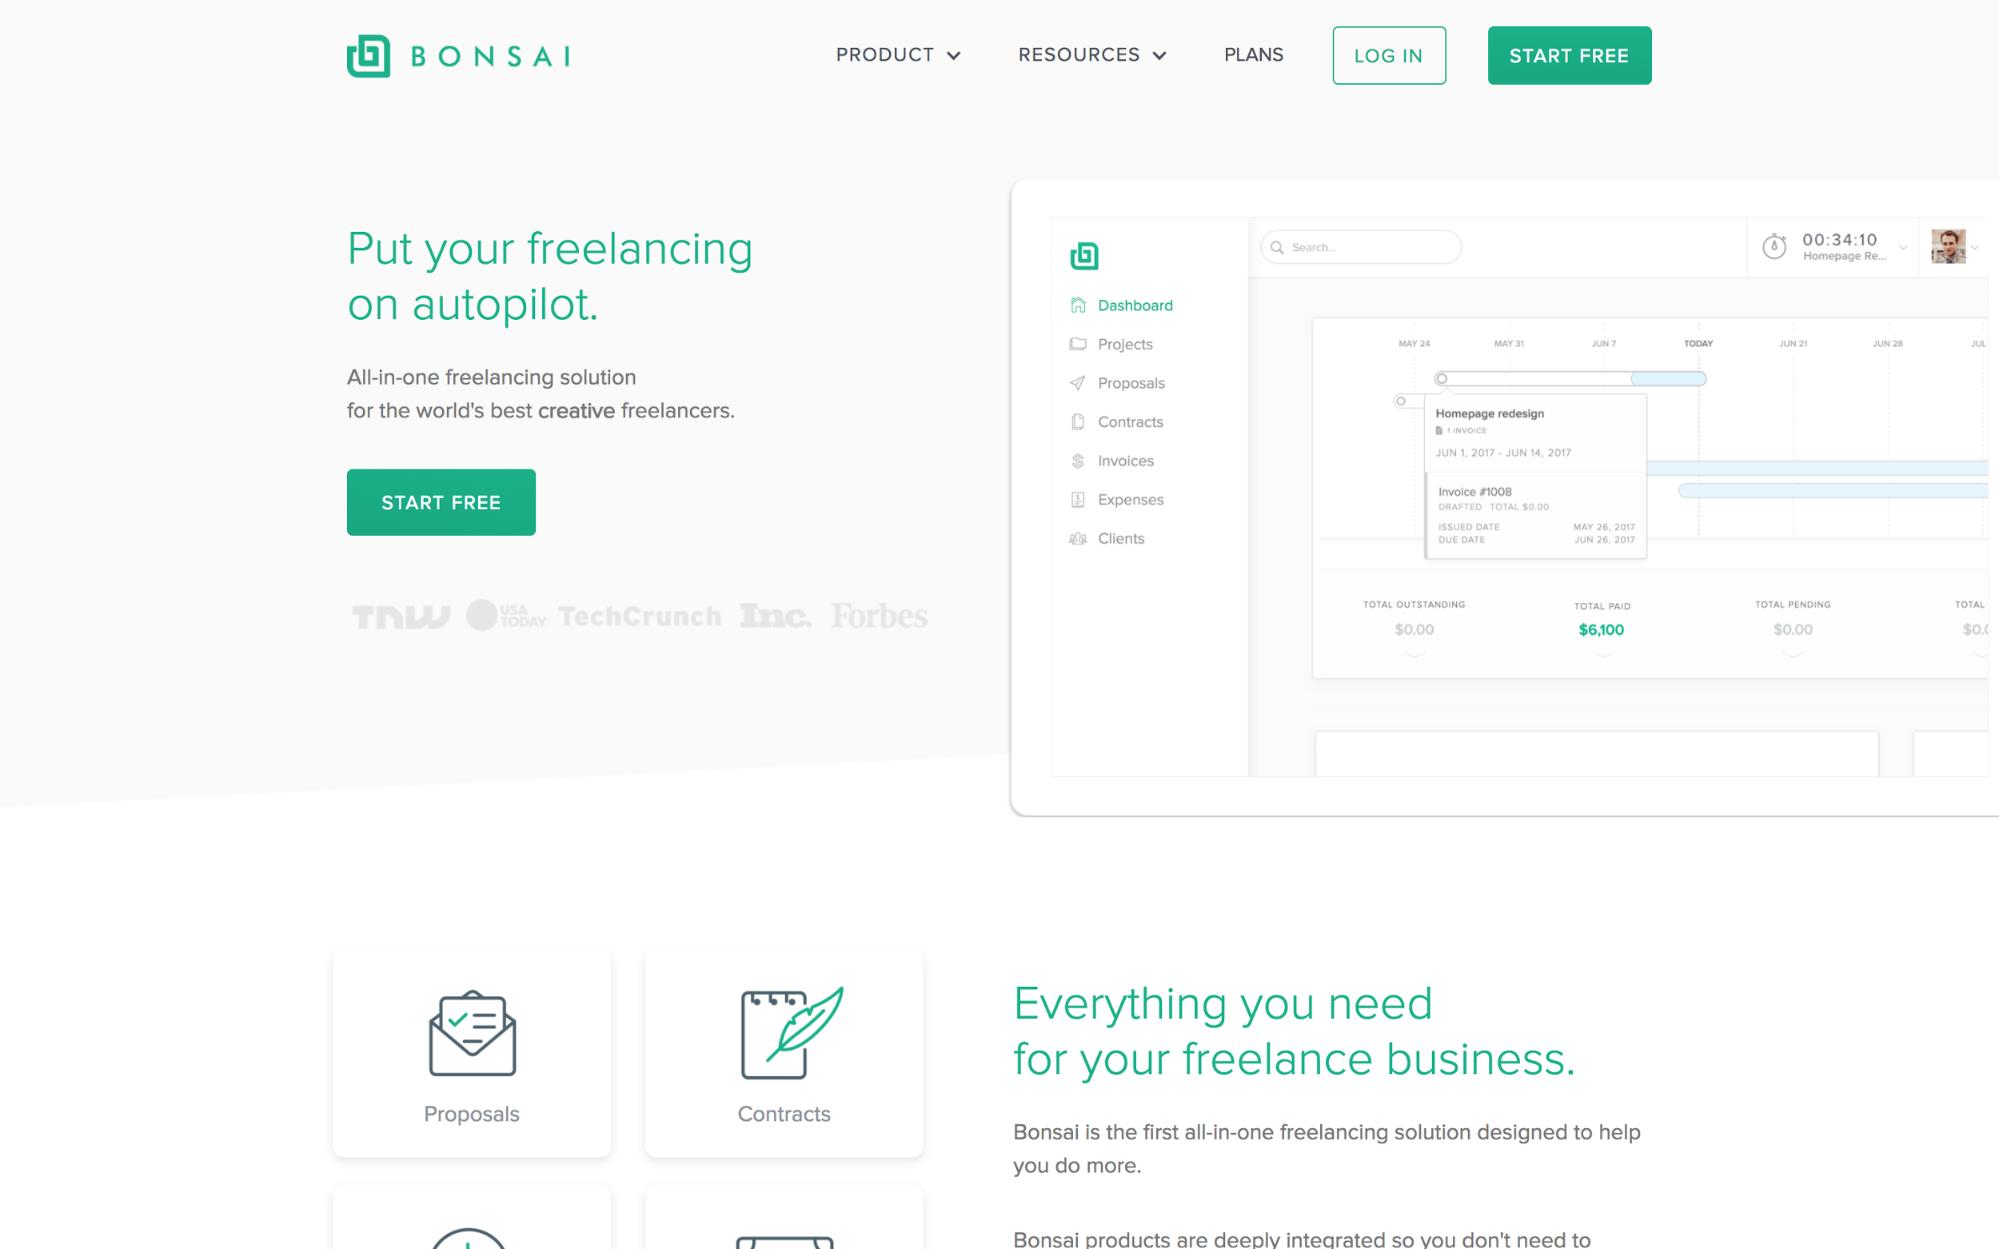 Bonsai's homepage